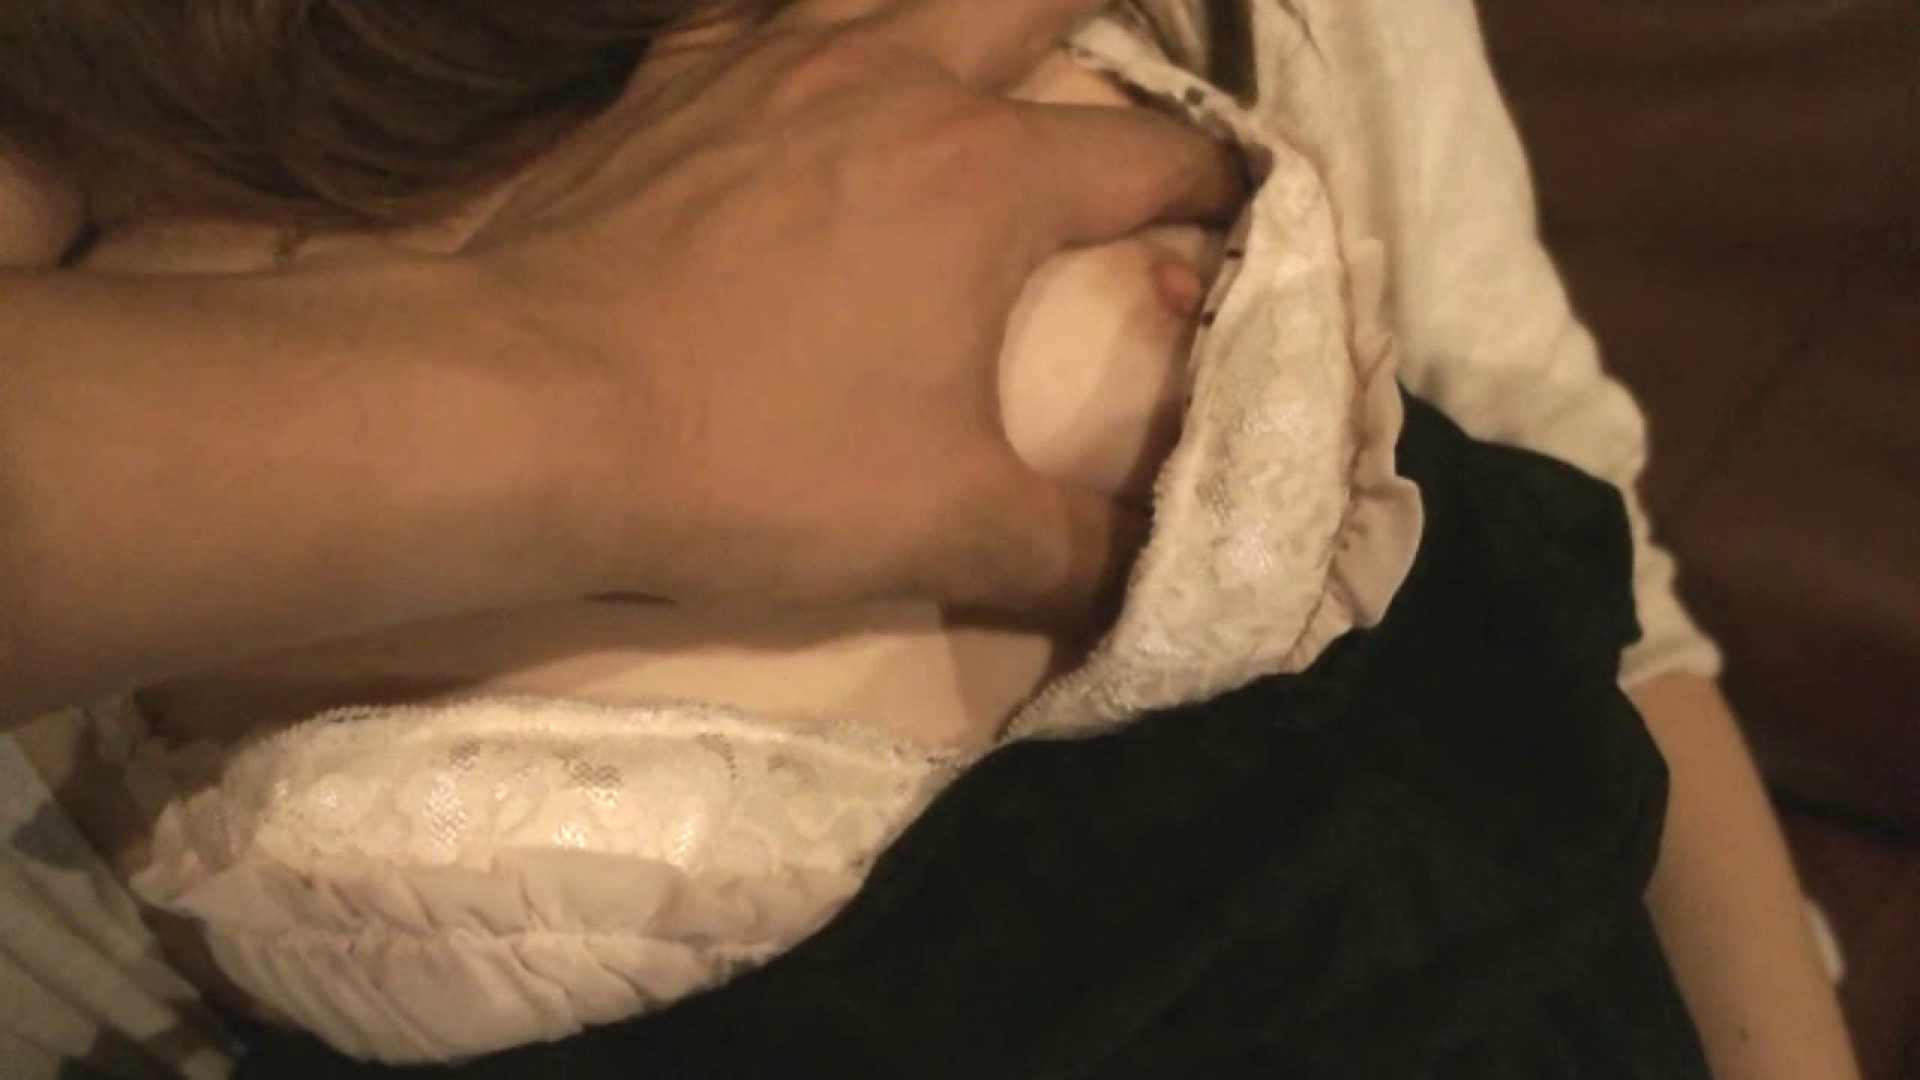 vol.10 【Sちゃん】現役女子大生19歳 クラブで知り合った友人 ギャルの実態 盗撮オマンコ無修正動画無料 45pic 37